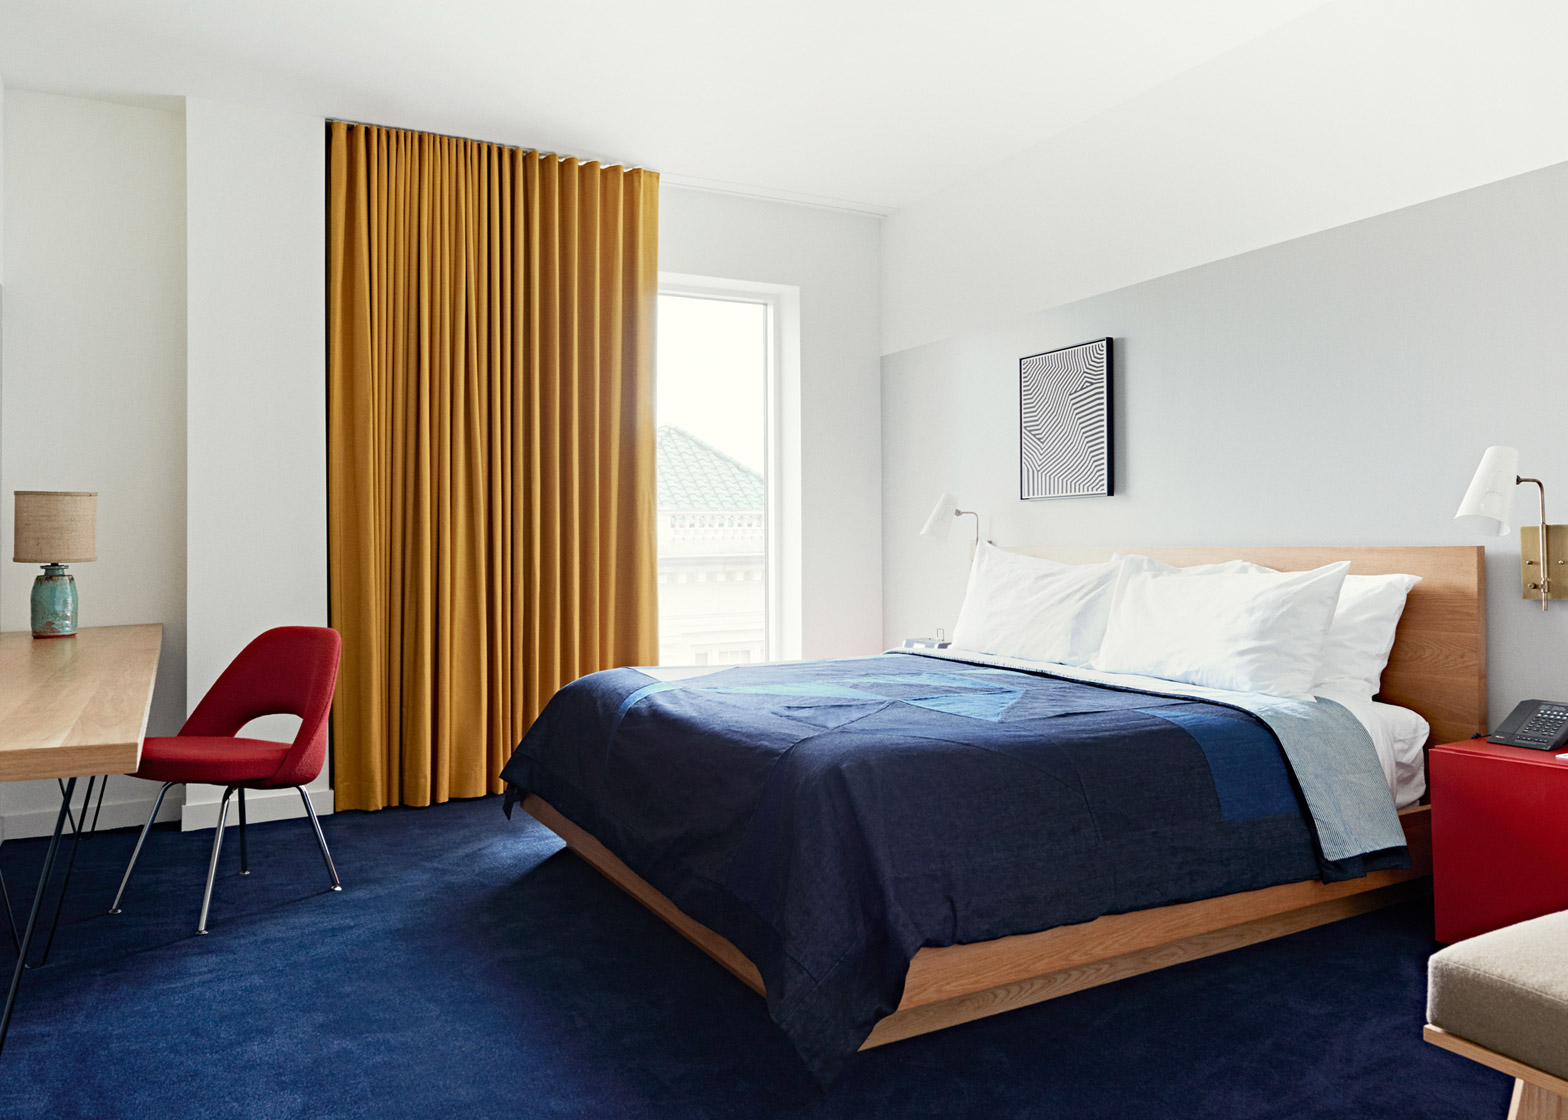 North-Carolina-hotel_The-Durham_Commune_Mutual-Savings-Bank-conversion_dezeen_1568_10